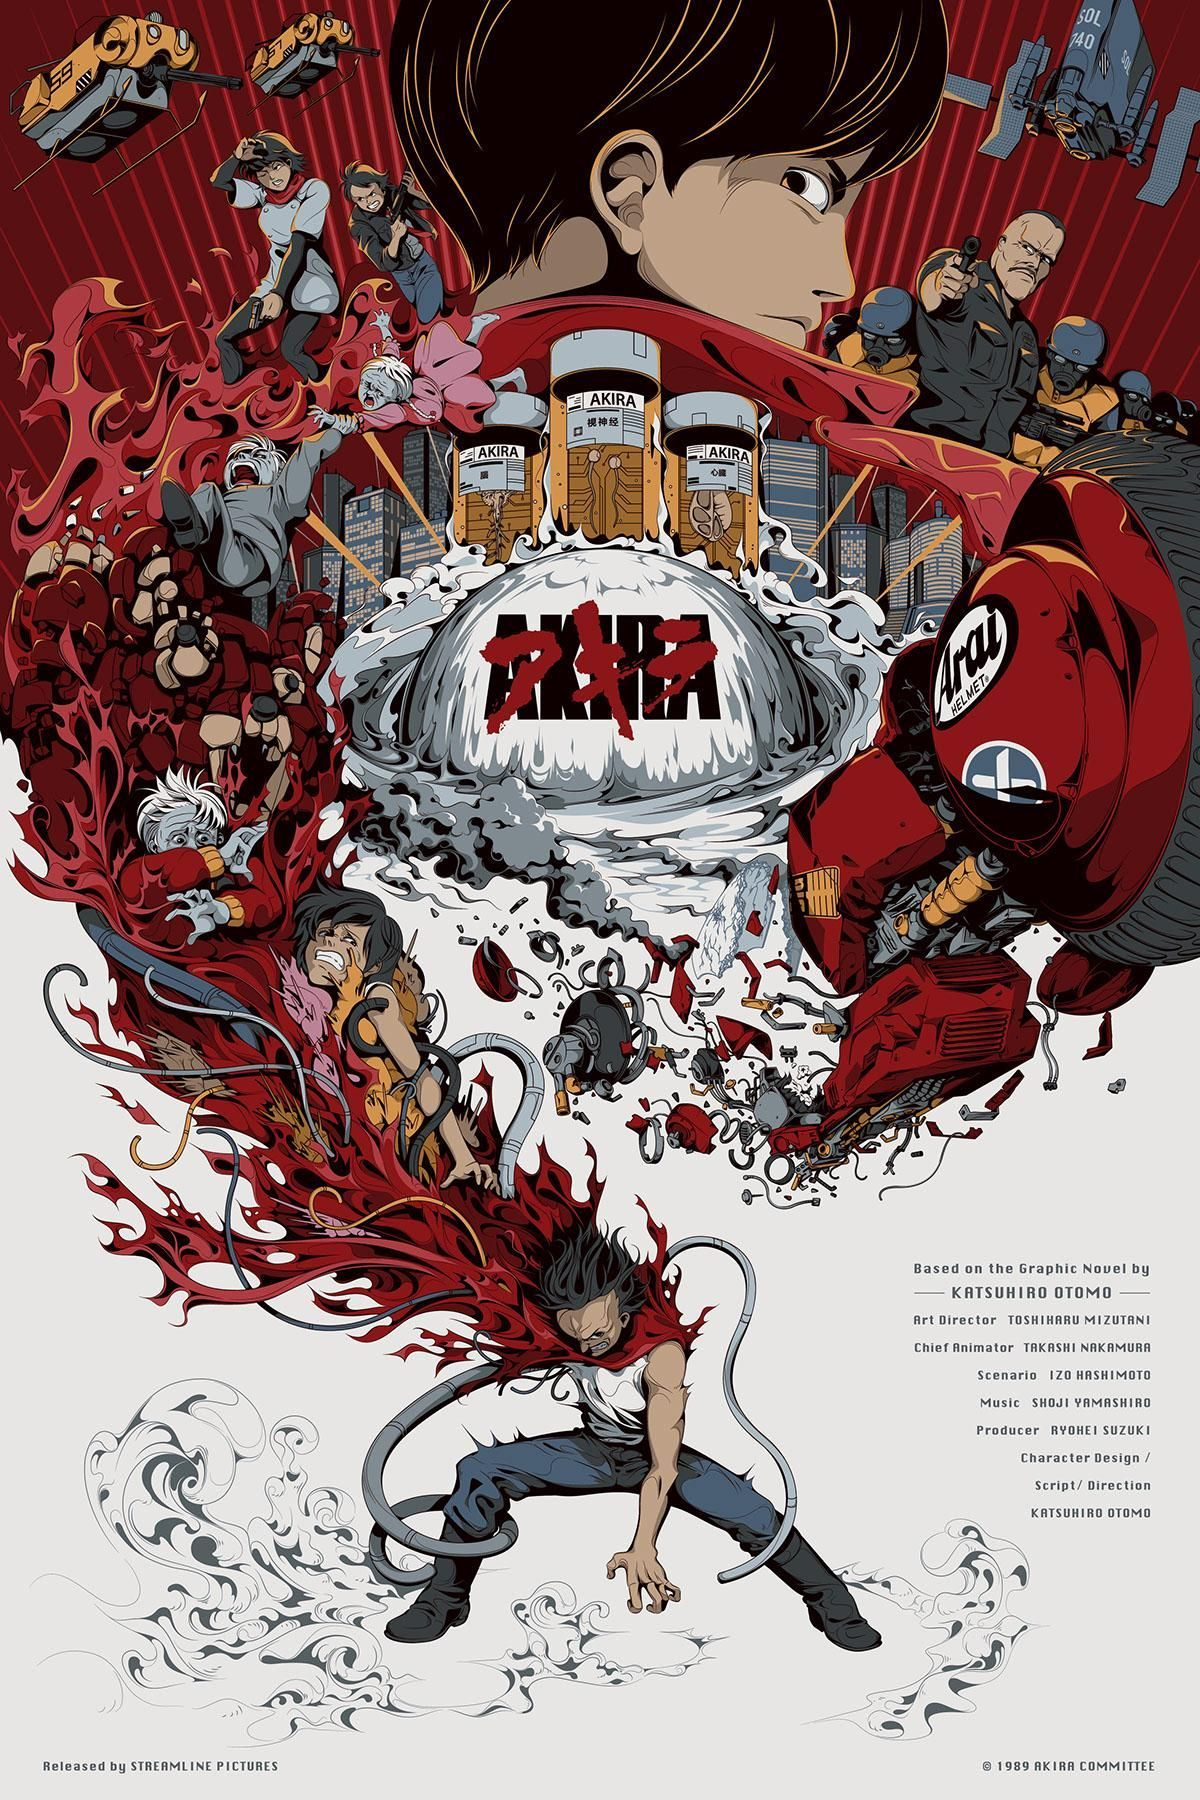 Akira Movie Poster Wallpapers Top Free Akira Movie Poster Backgrounds Wallpaperaccess